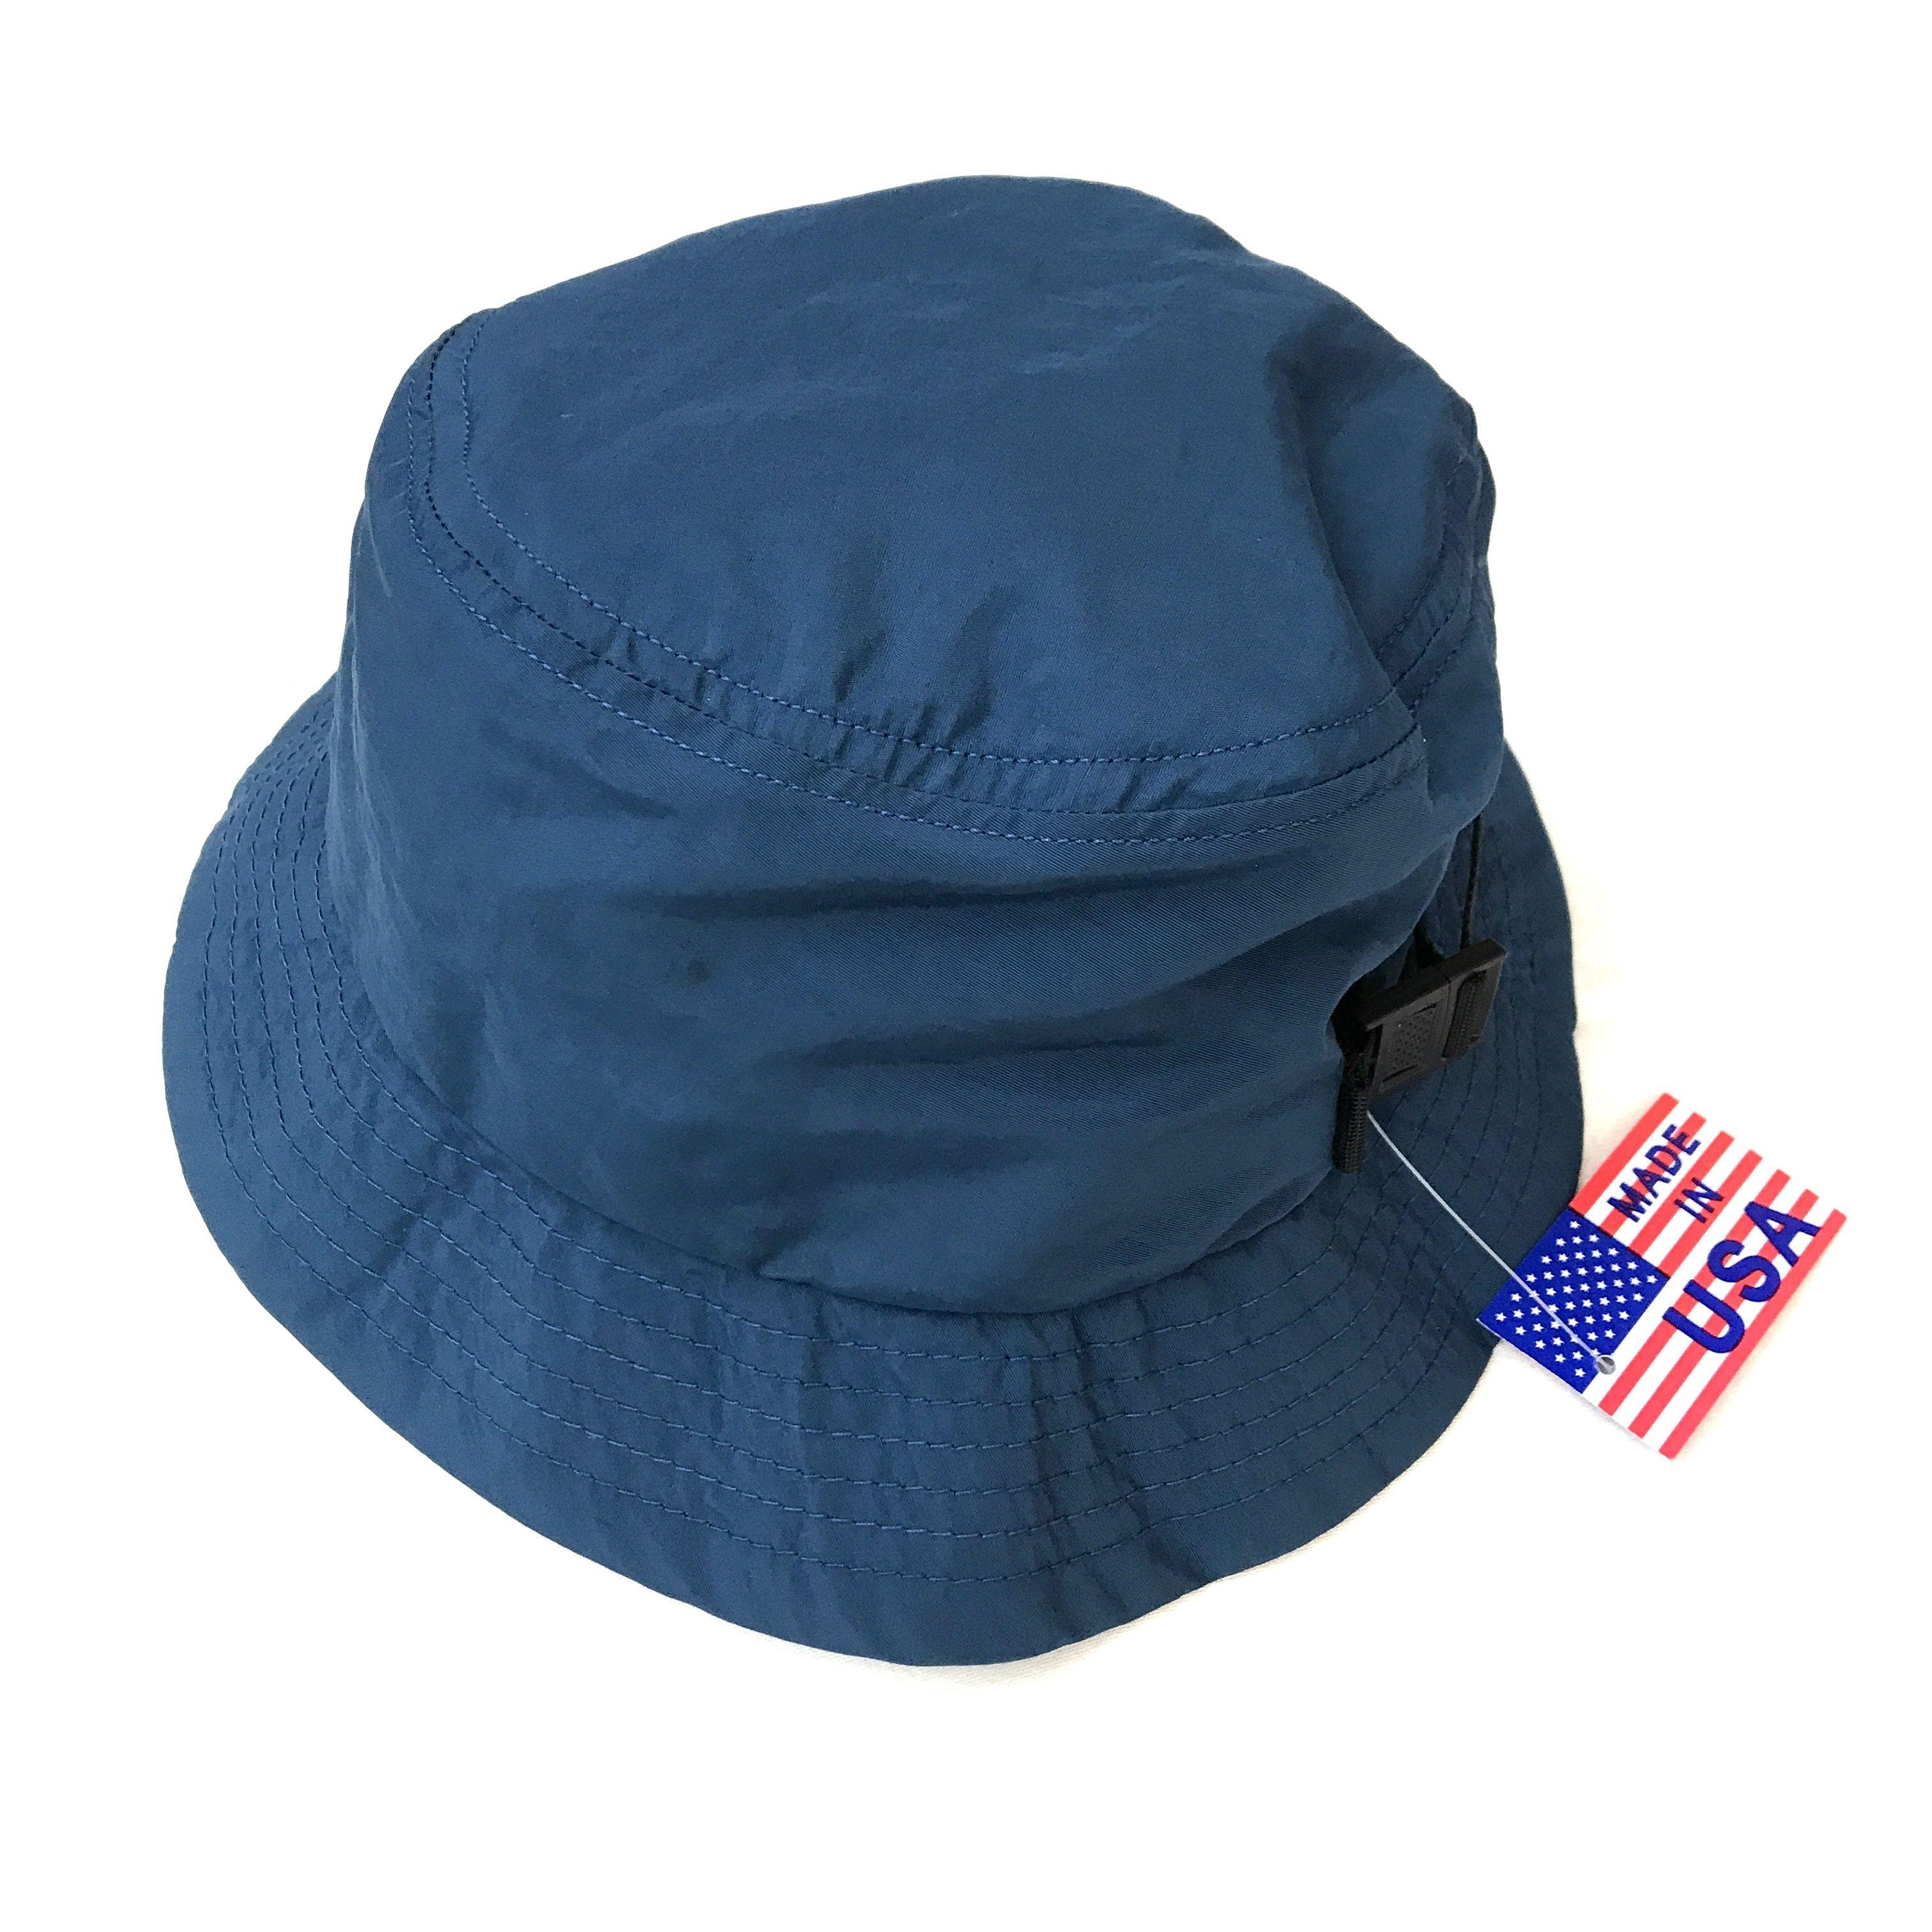 Made in USA / NEC / Nylon Bucket Hat / NAVY